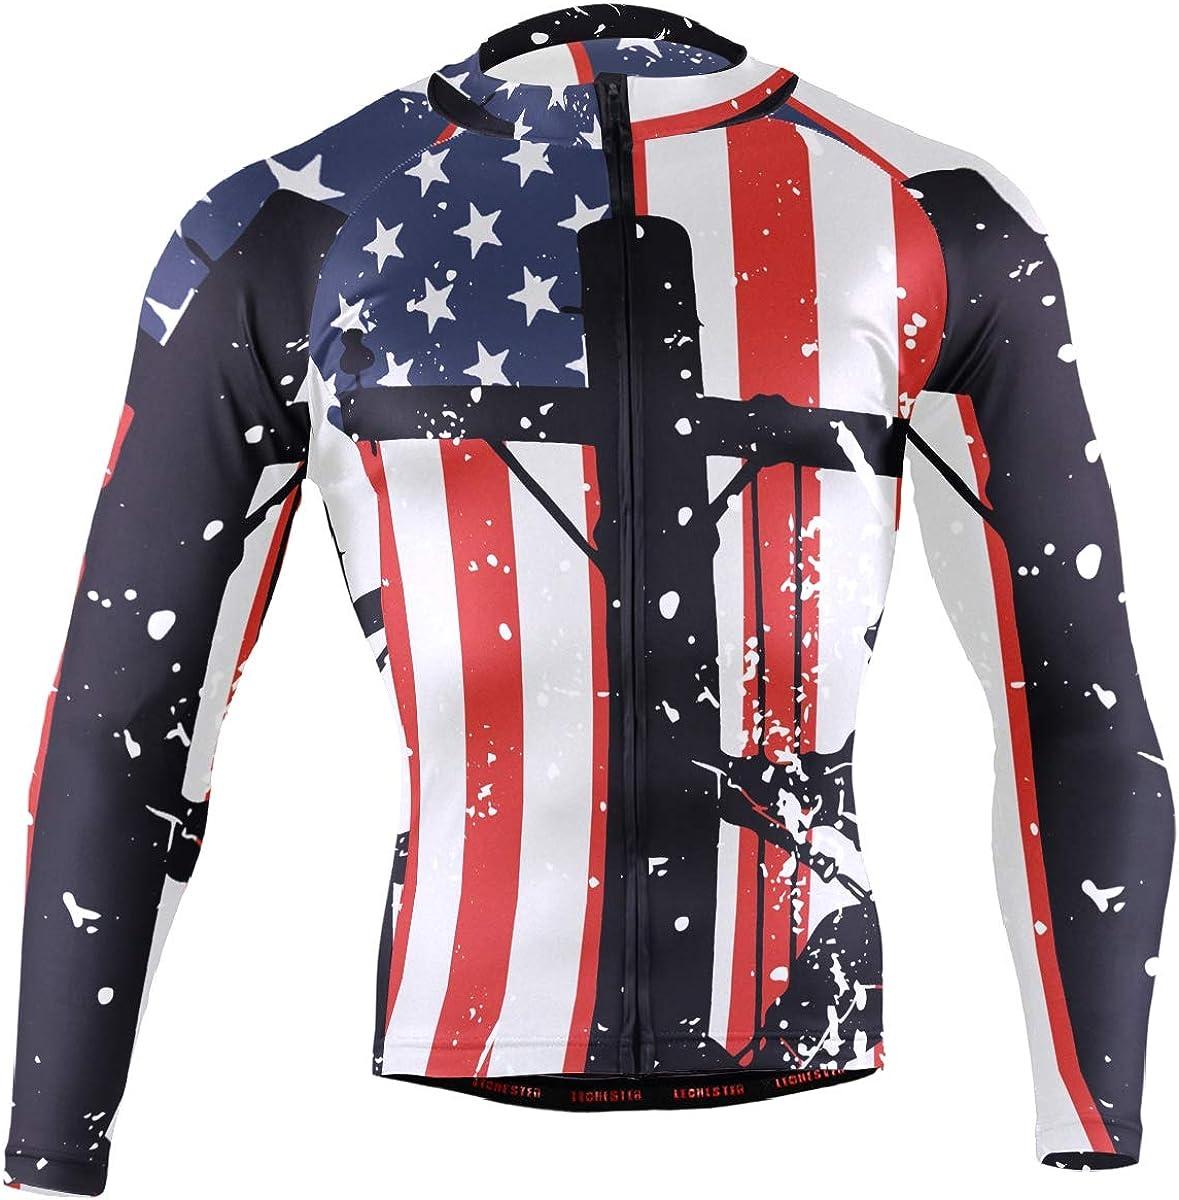 XUWU Mens Cycling Jersey Realtree Camo Long Sleeve Riding Tops Bike Jacket